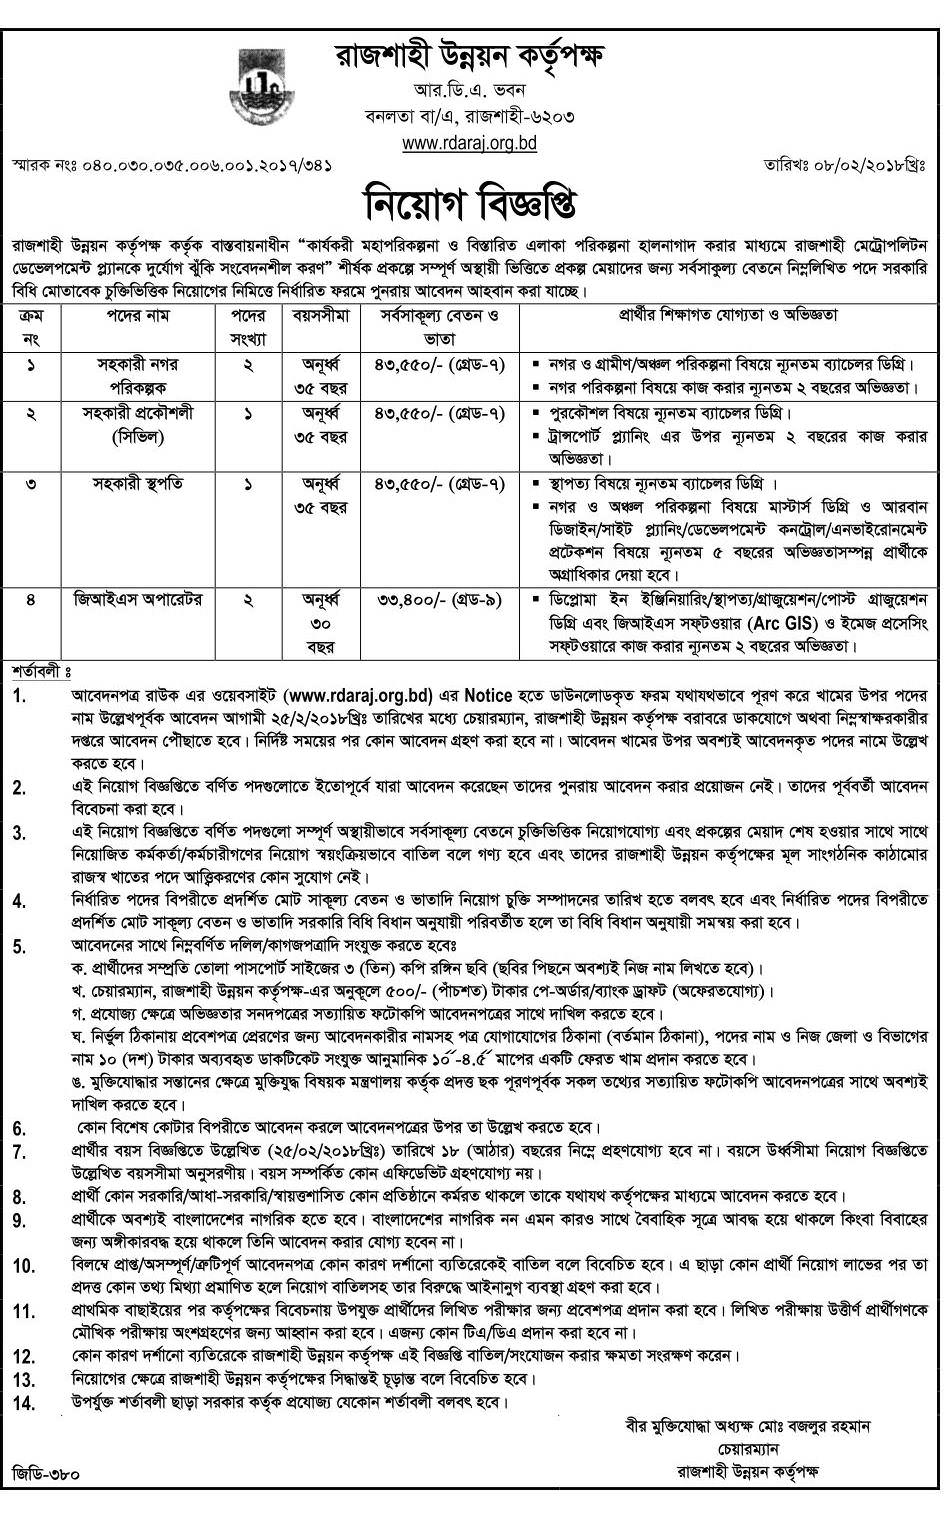 Rajshahi Development Authority Job Circular